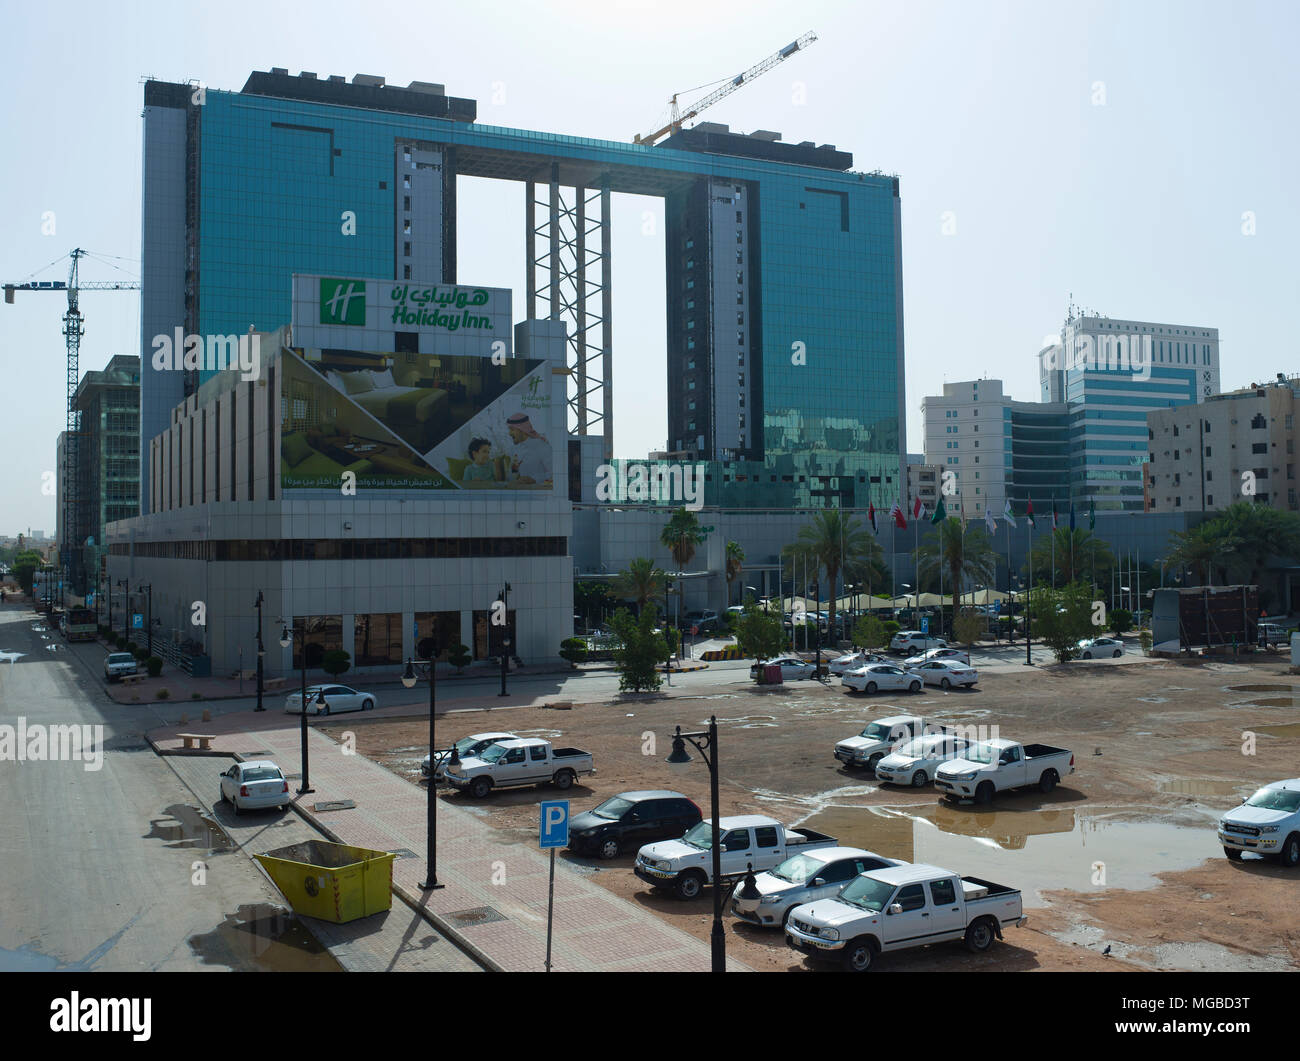 51b6a20b42c La costruzione del nuovo vetro Moderne torri gemelle a Olaya District di  mattina presto a Riyadh